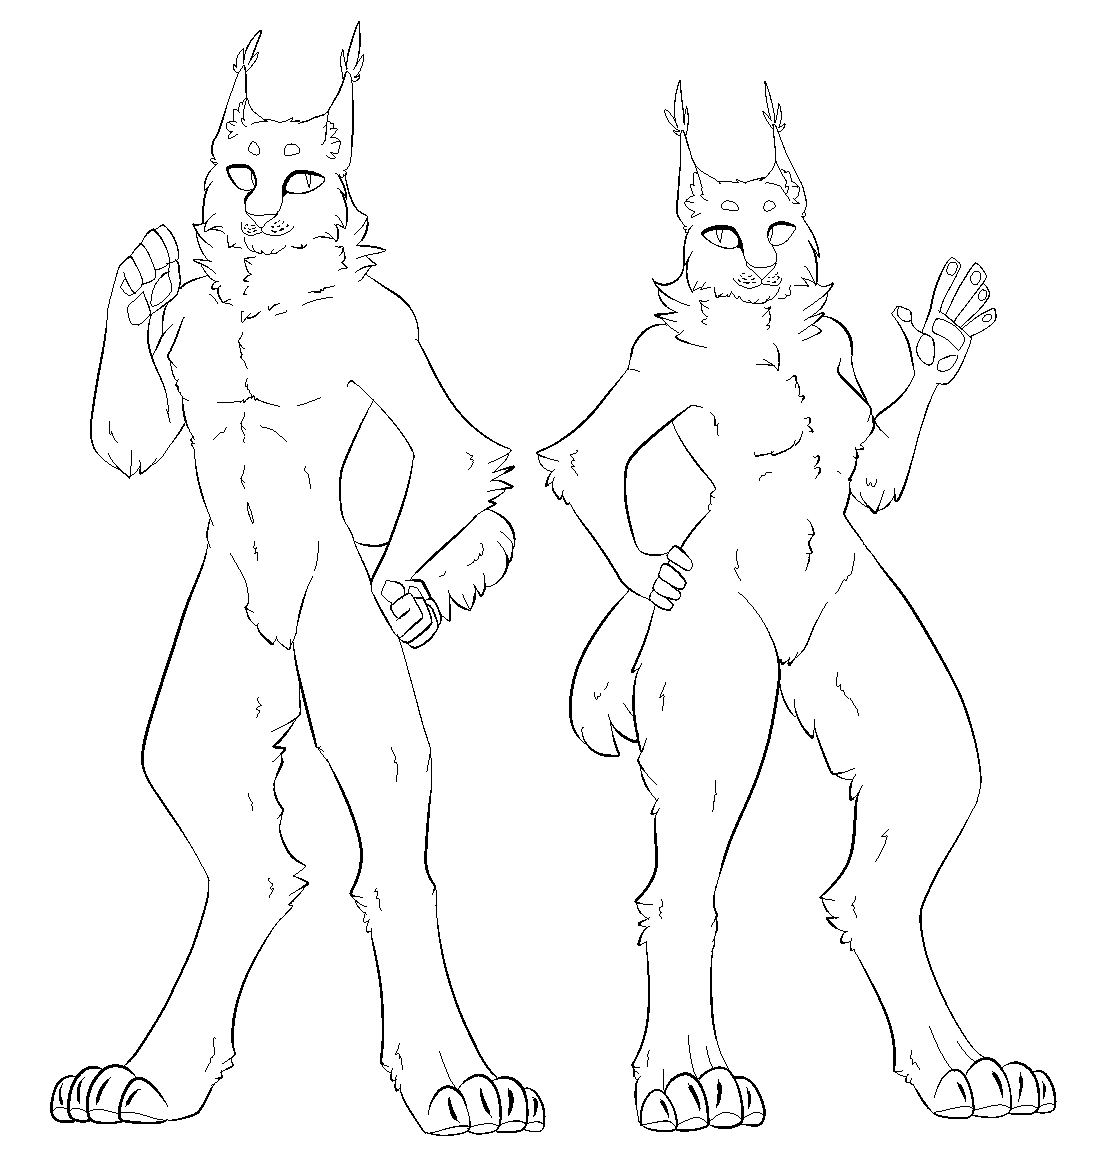 Anthro Lynx Base